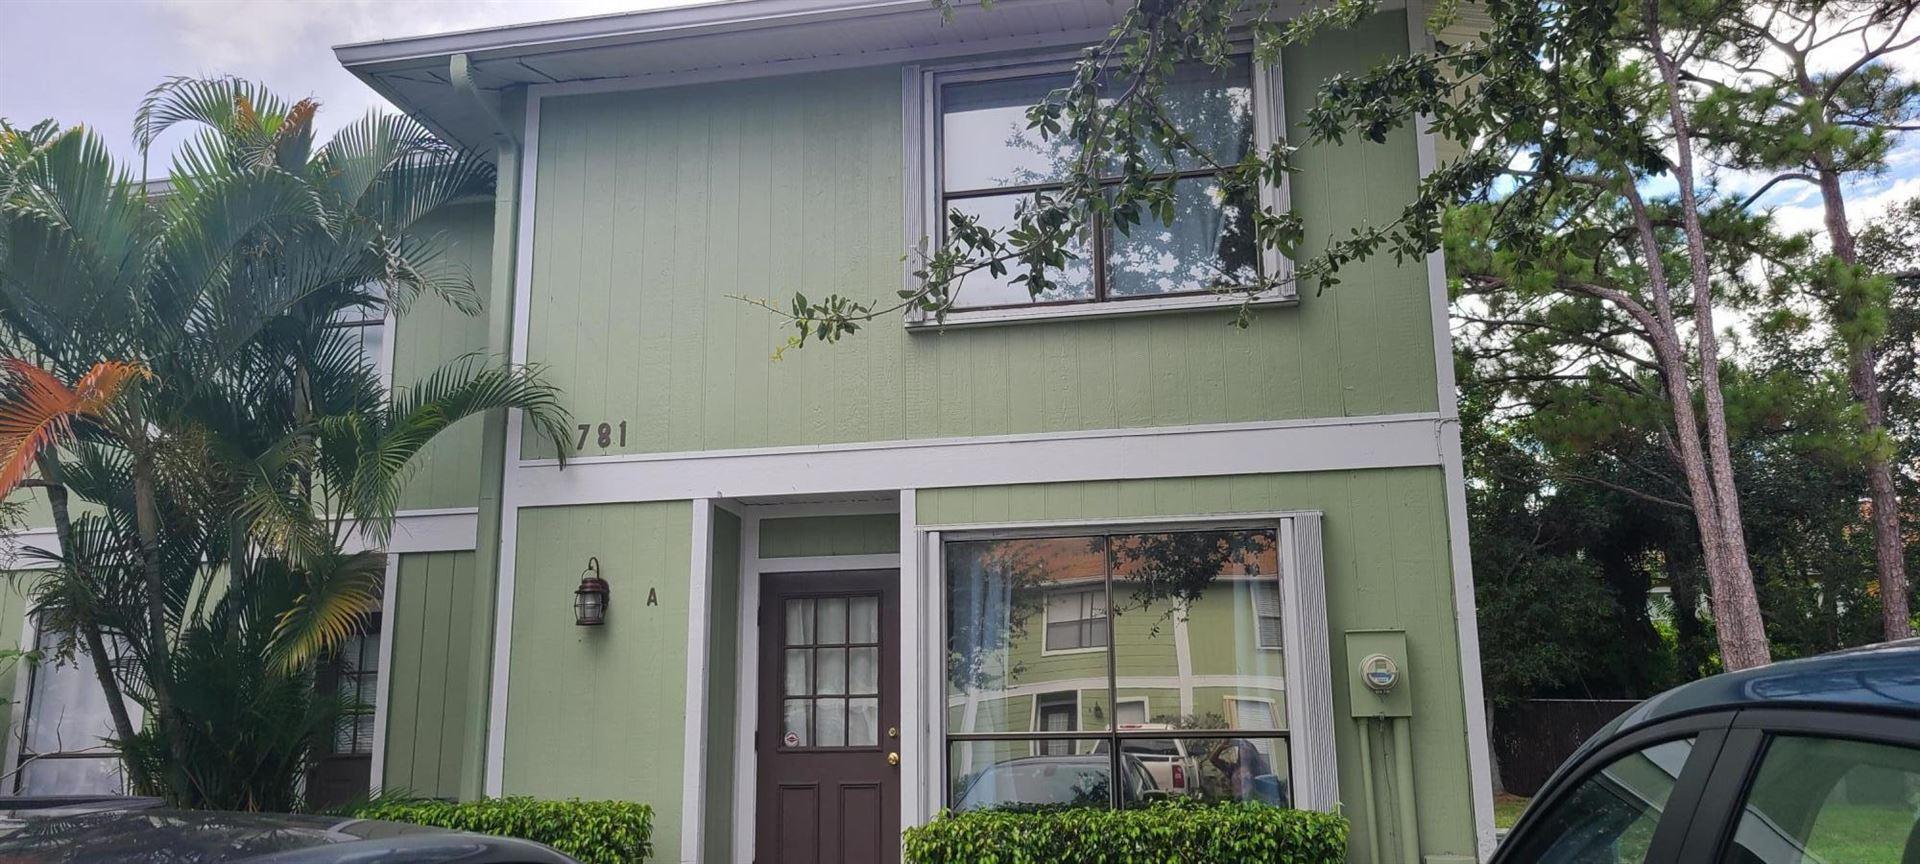 781 Hill Drive #A, West Palm Beach, FL 33415 - #: RX-10631935